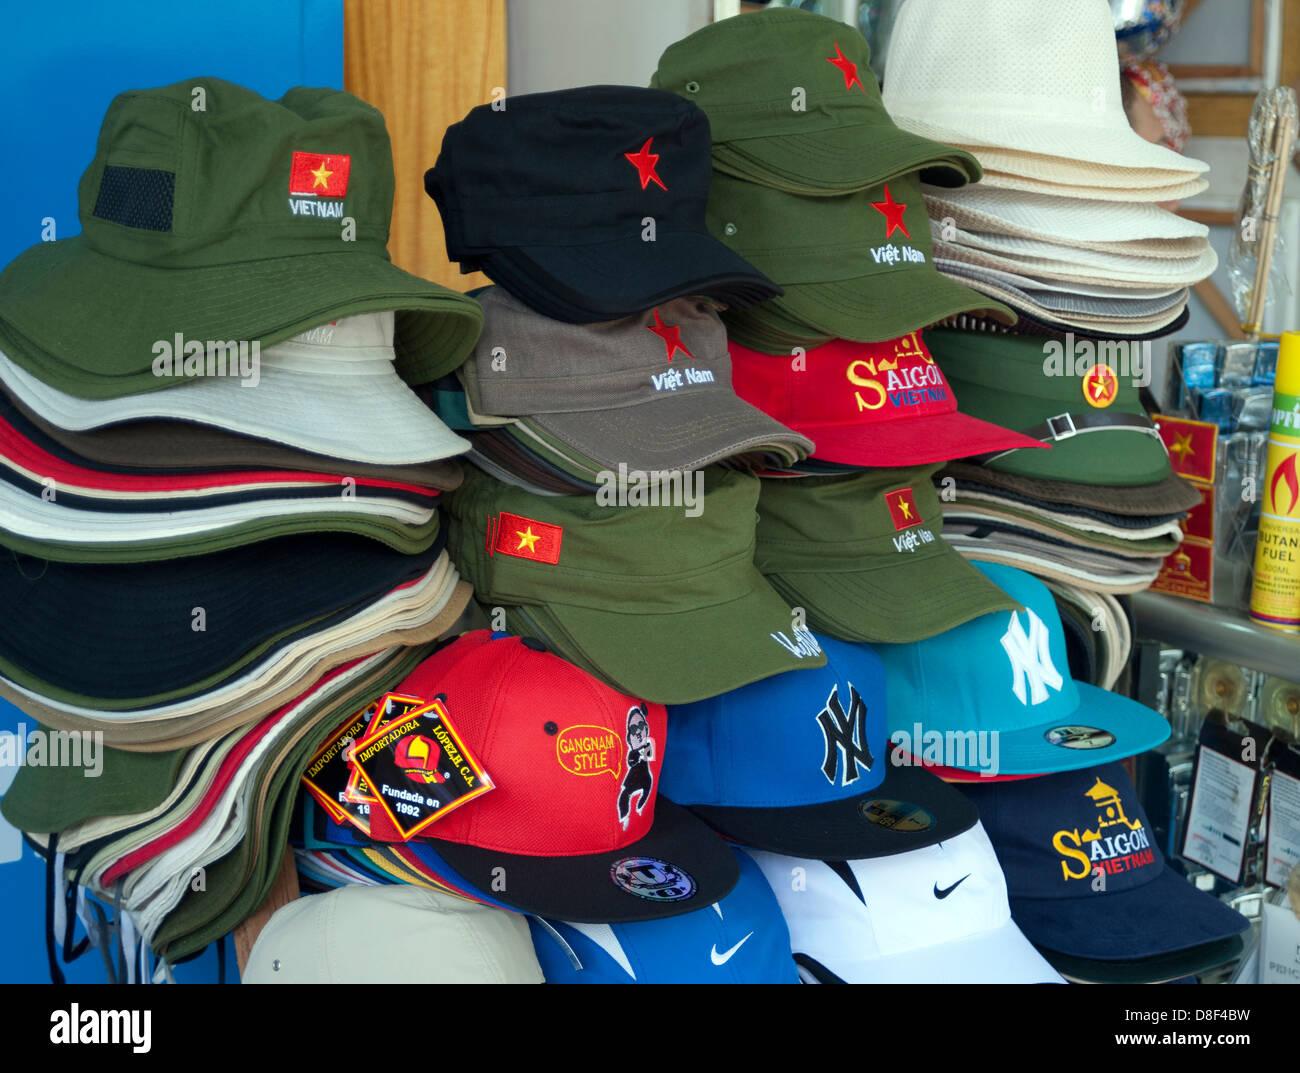 Baseball Hats Stock Photos   Baseball Hats Stock Images - Page 2 - Alamy 74a4e08f601e